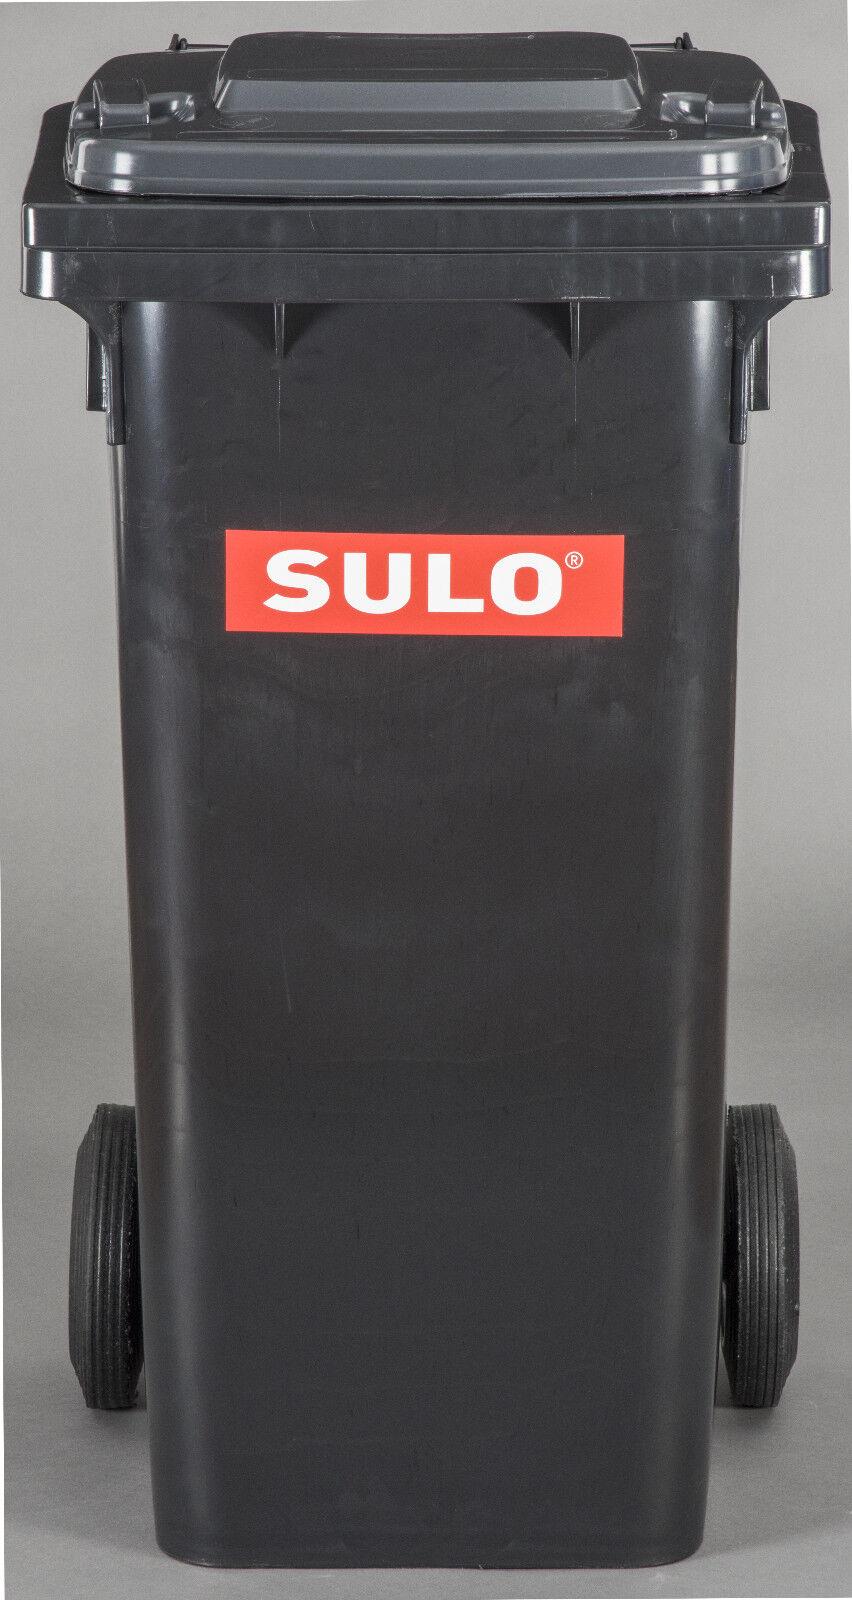 120 Liter Abfalltonne, Restmülltone, Restmülltone, Restmülltone, Abfallbehälter, Tonne, Behälter NEU schwarz ade36d